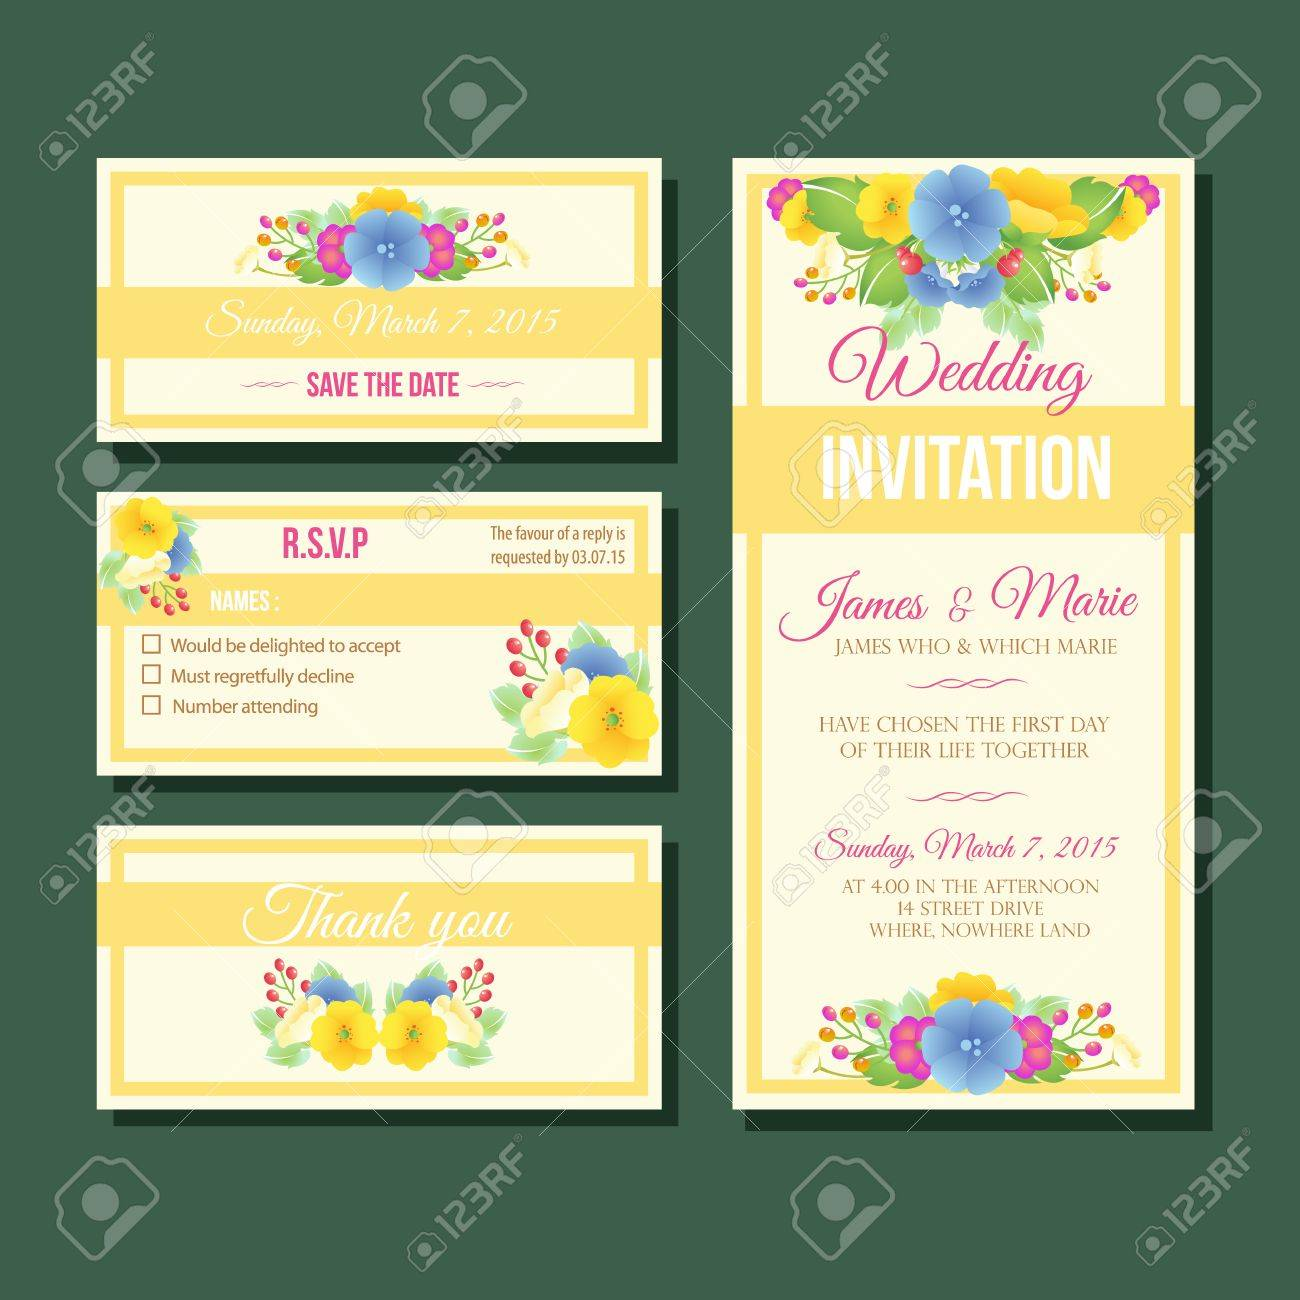 Yellow Wedding Invitation Template Royalty Free Cliparts Vectors